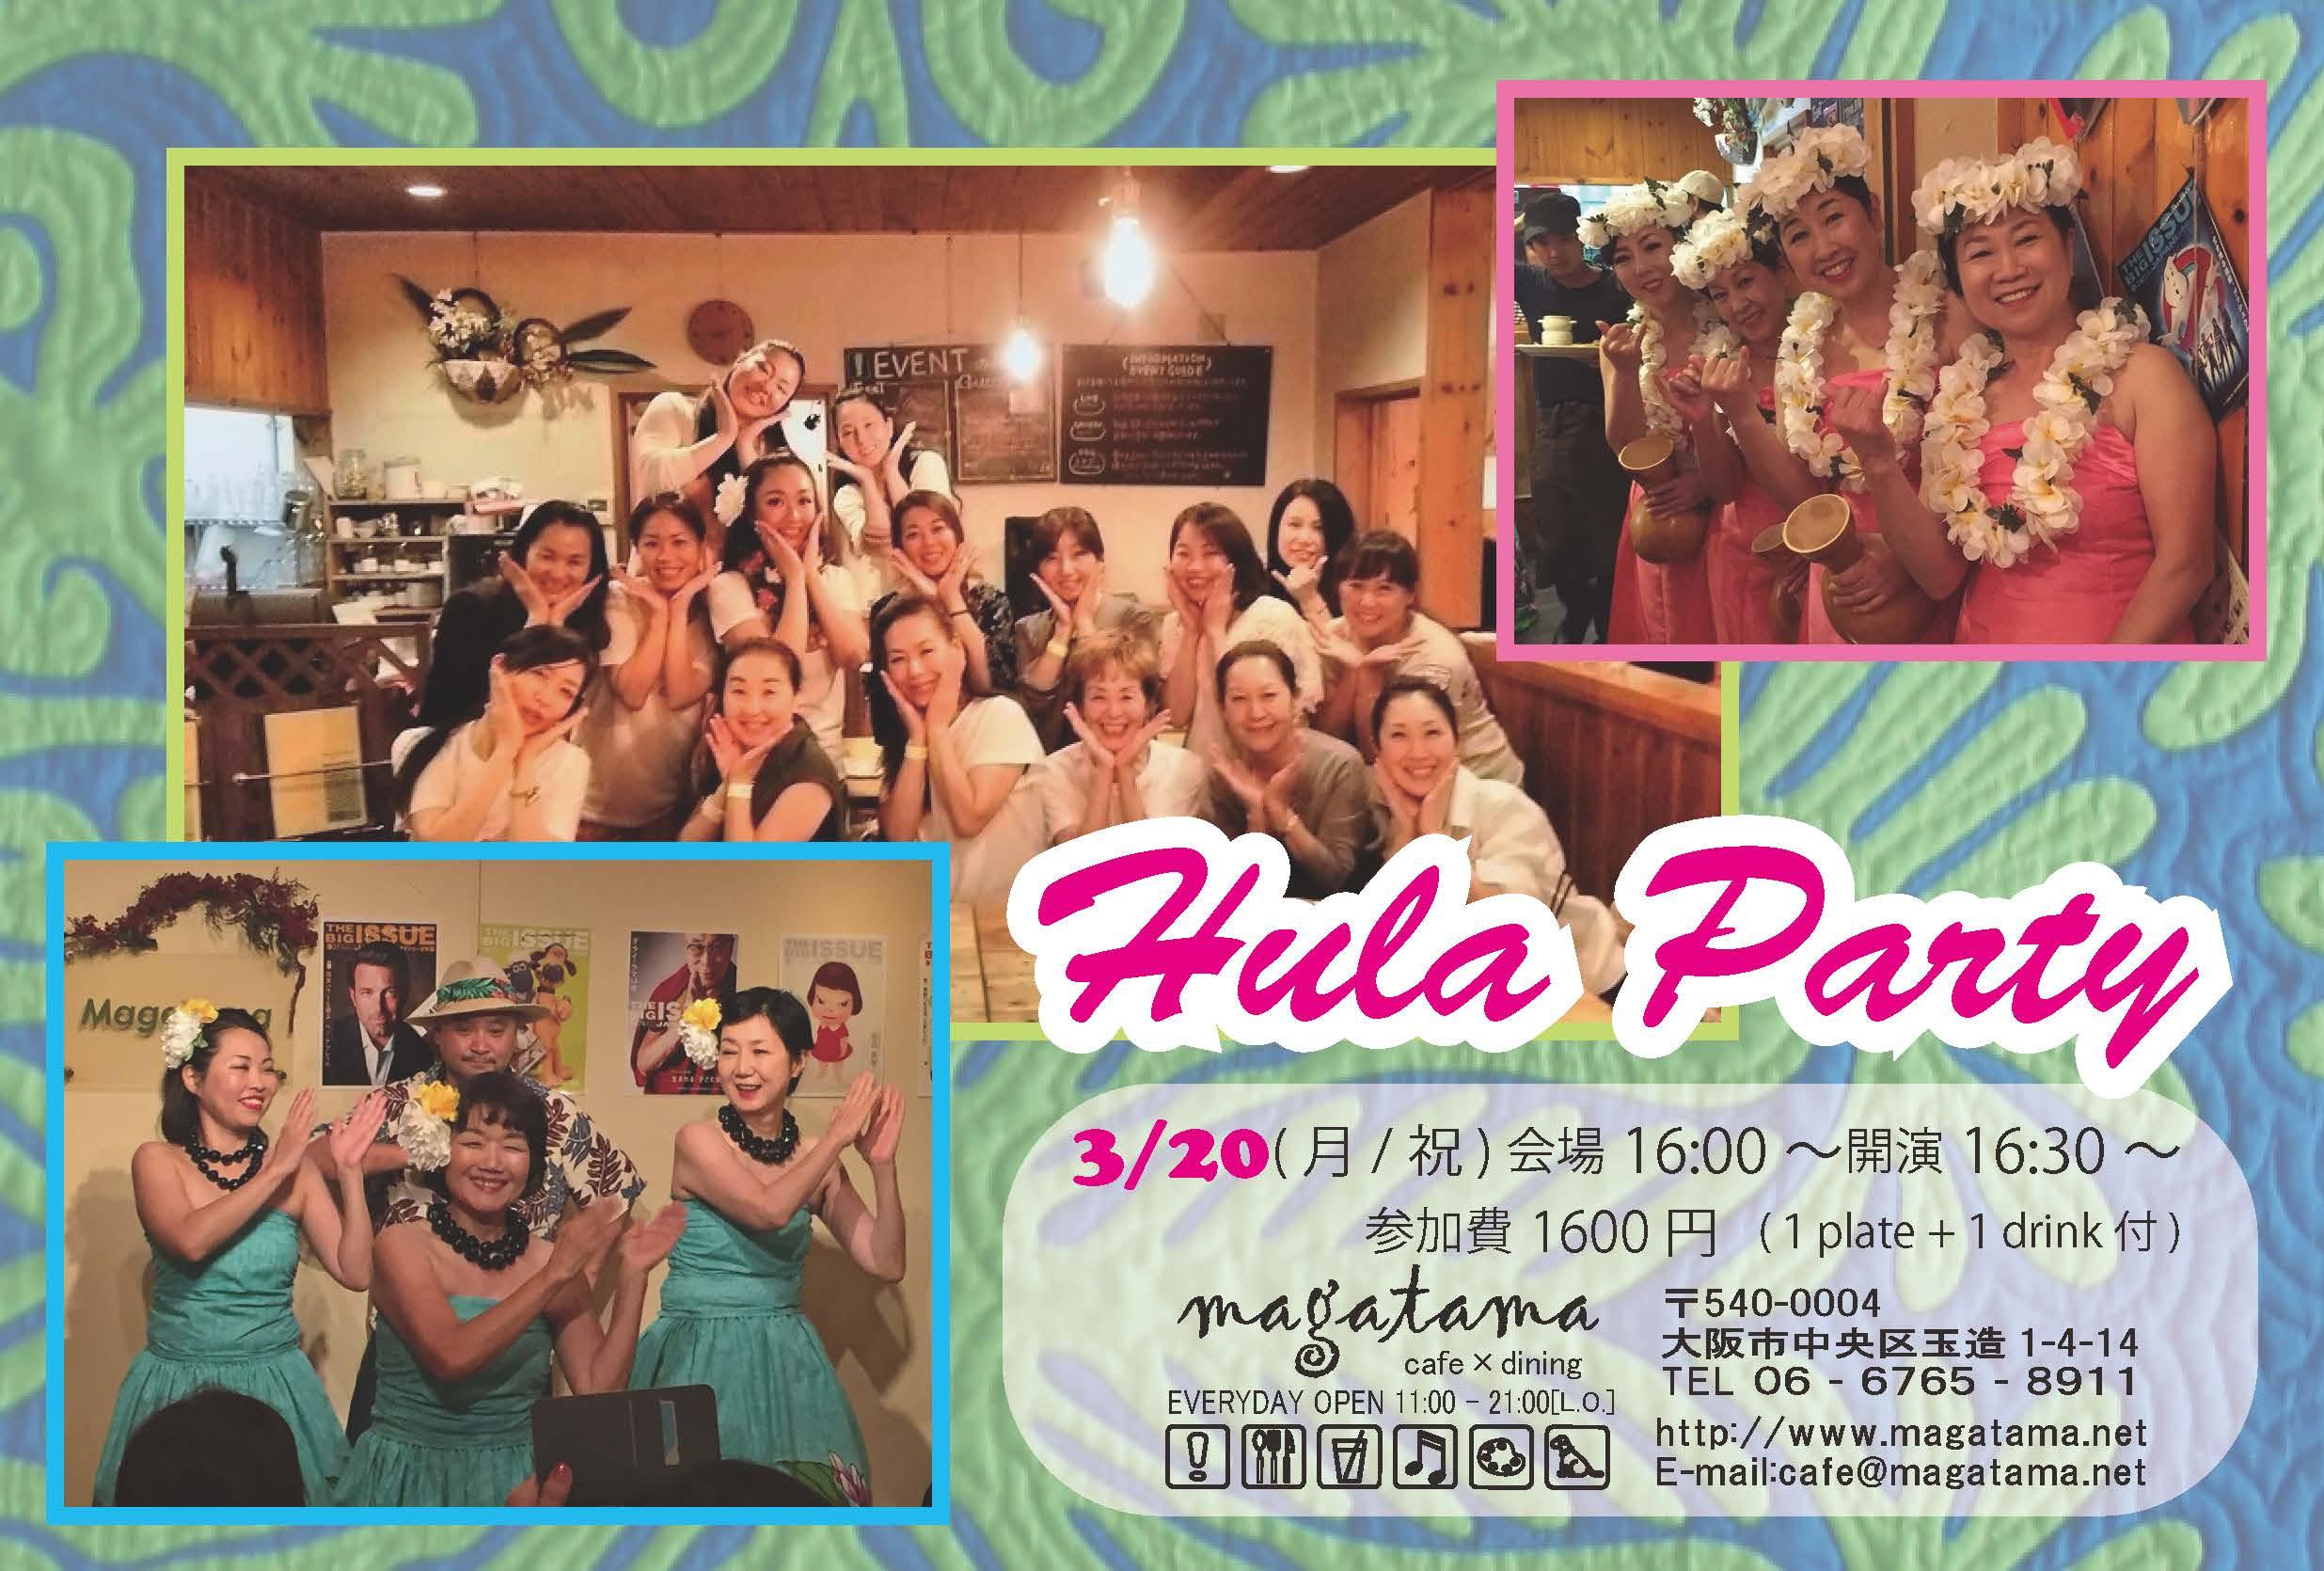 Hula Party [Live]